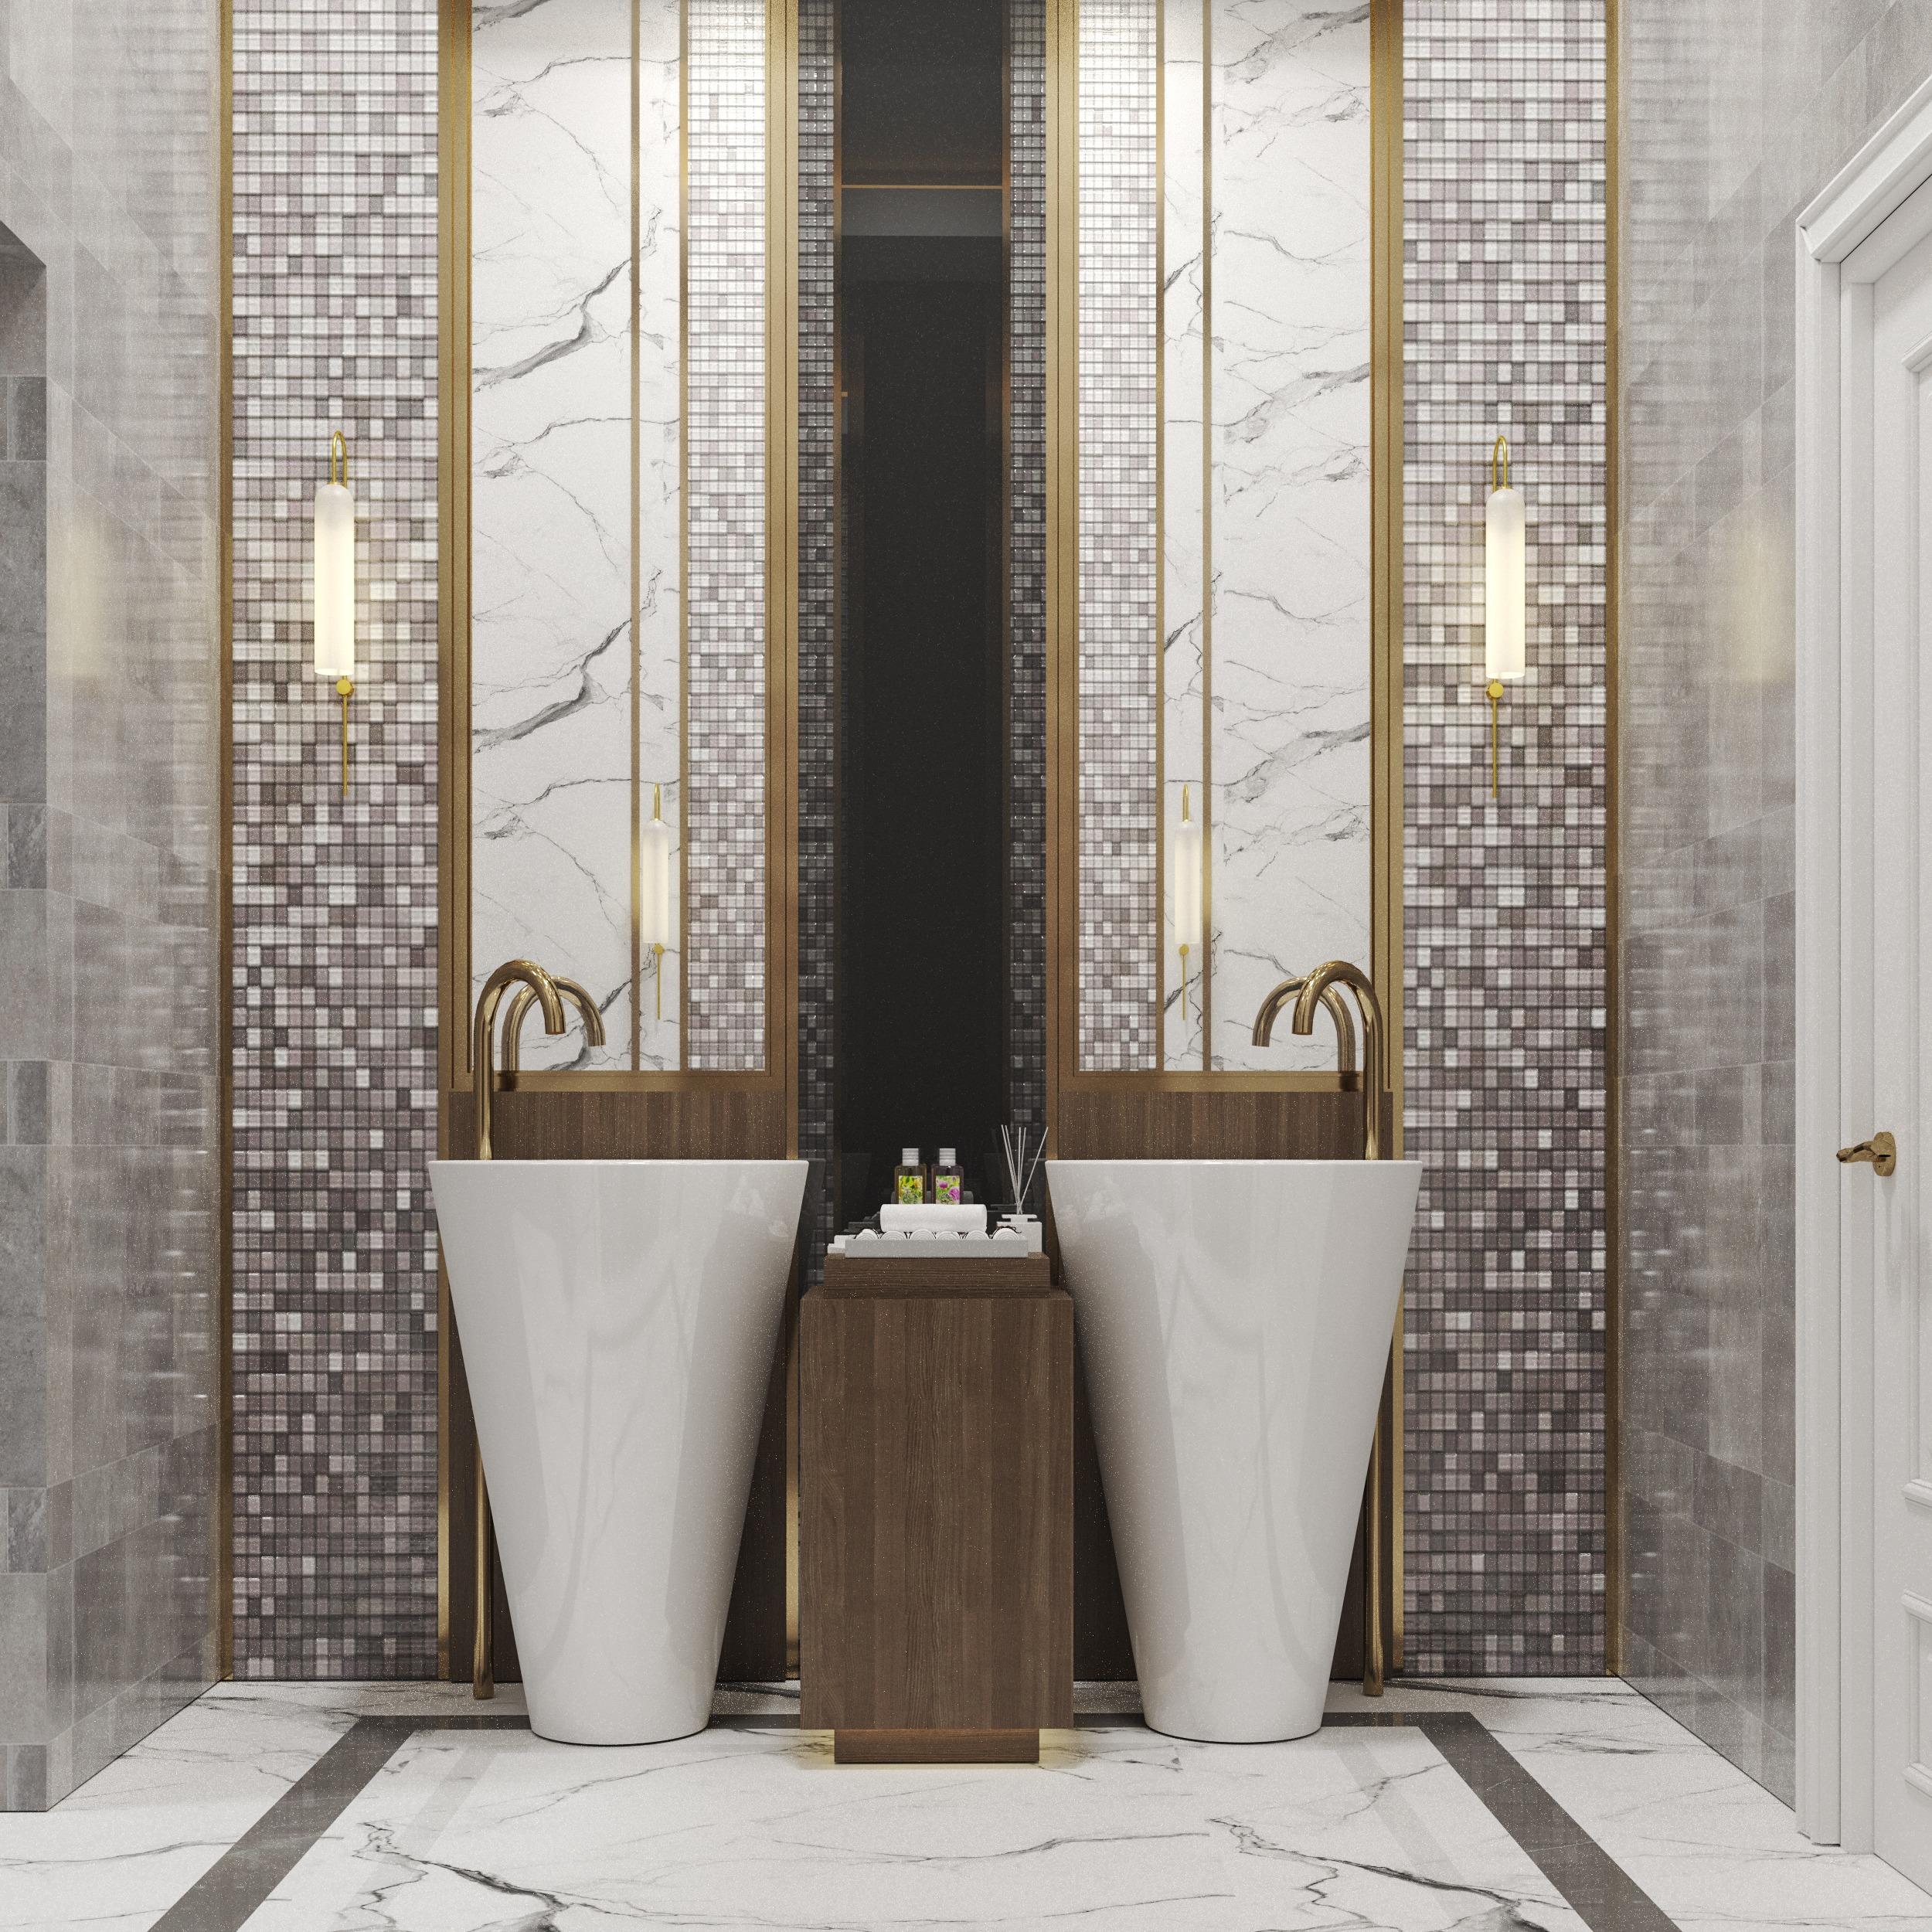 mirror - golden - marble